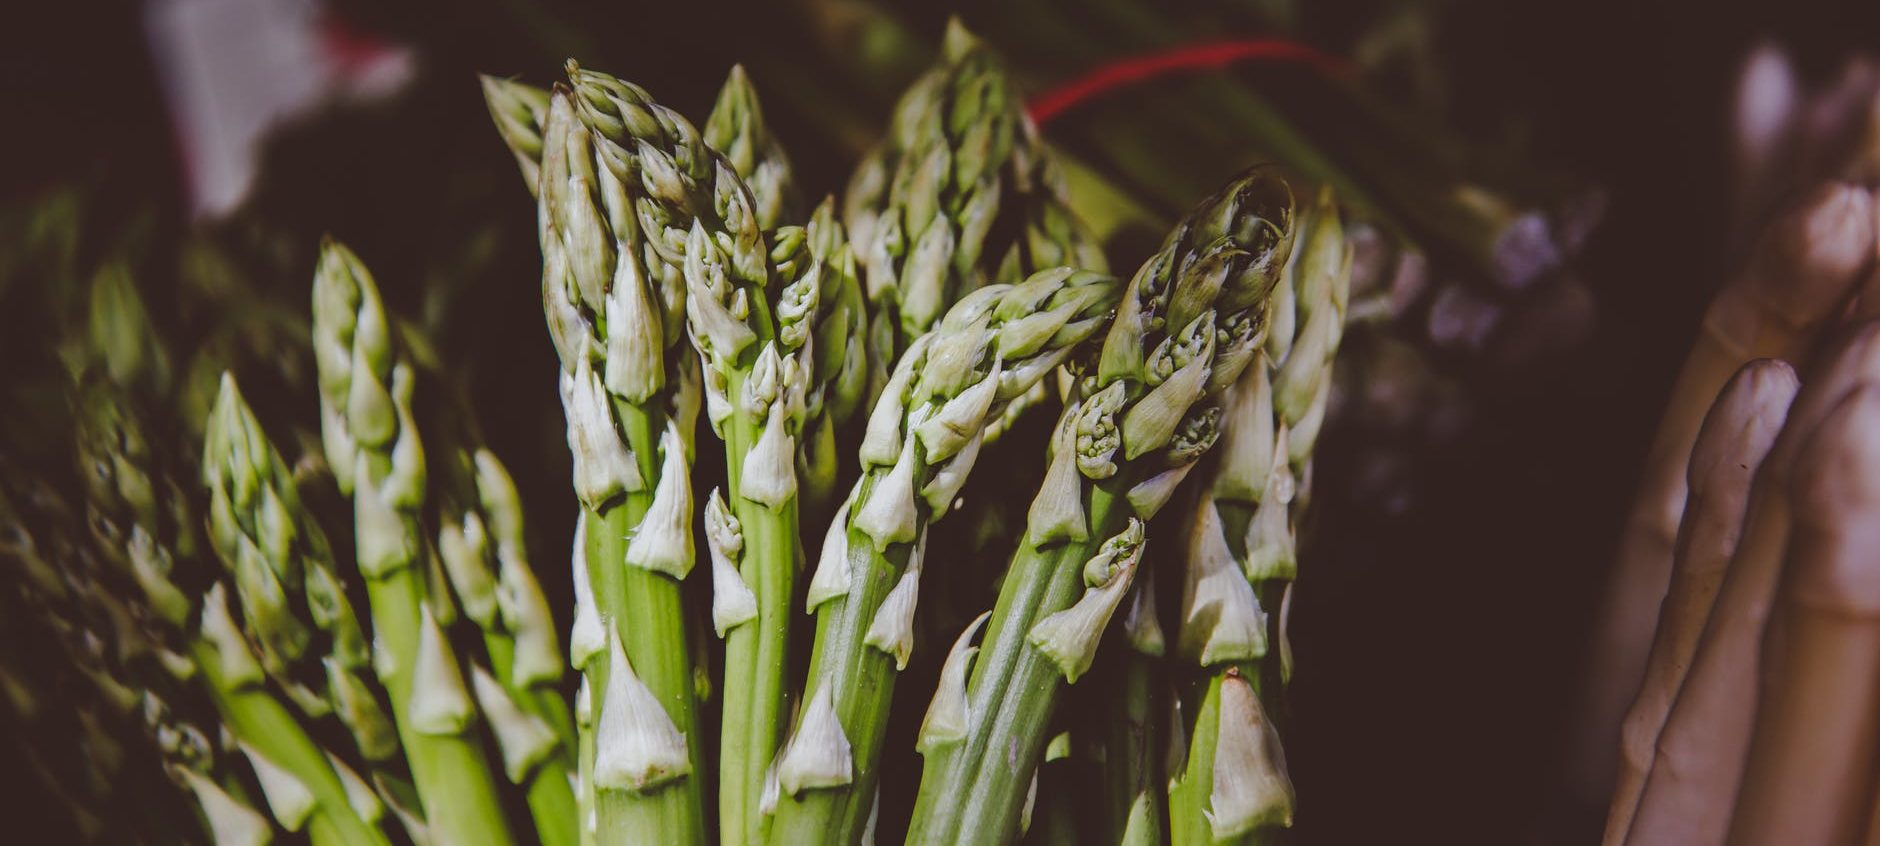 Pasta con asparagi e funghi – vegan